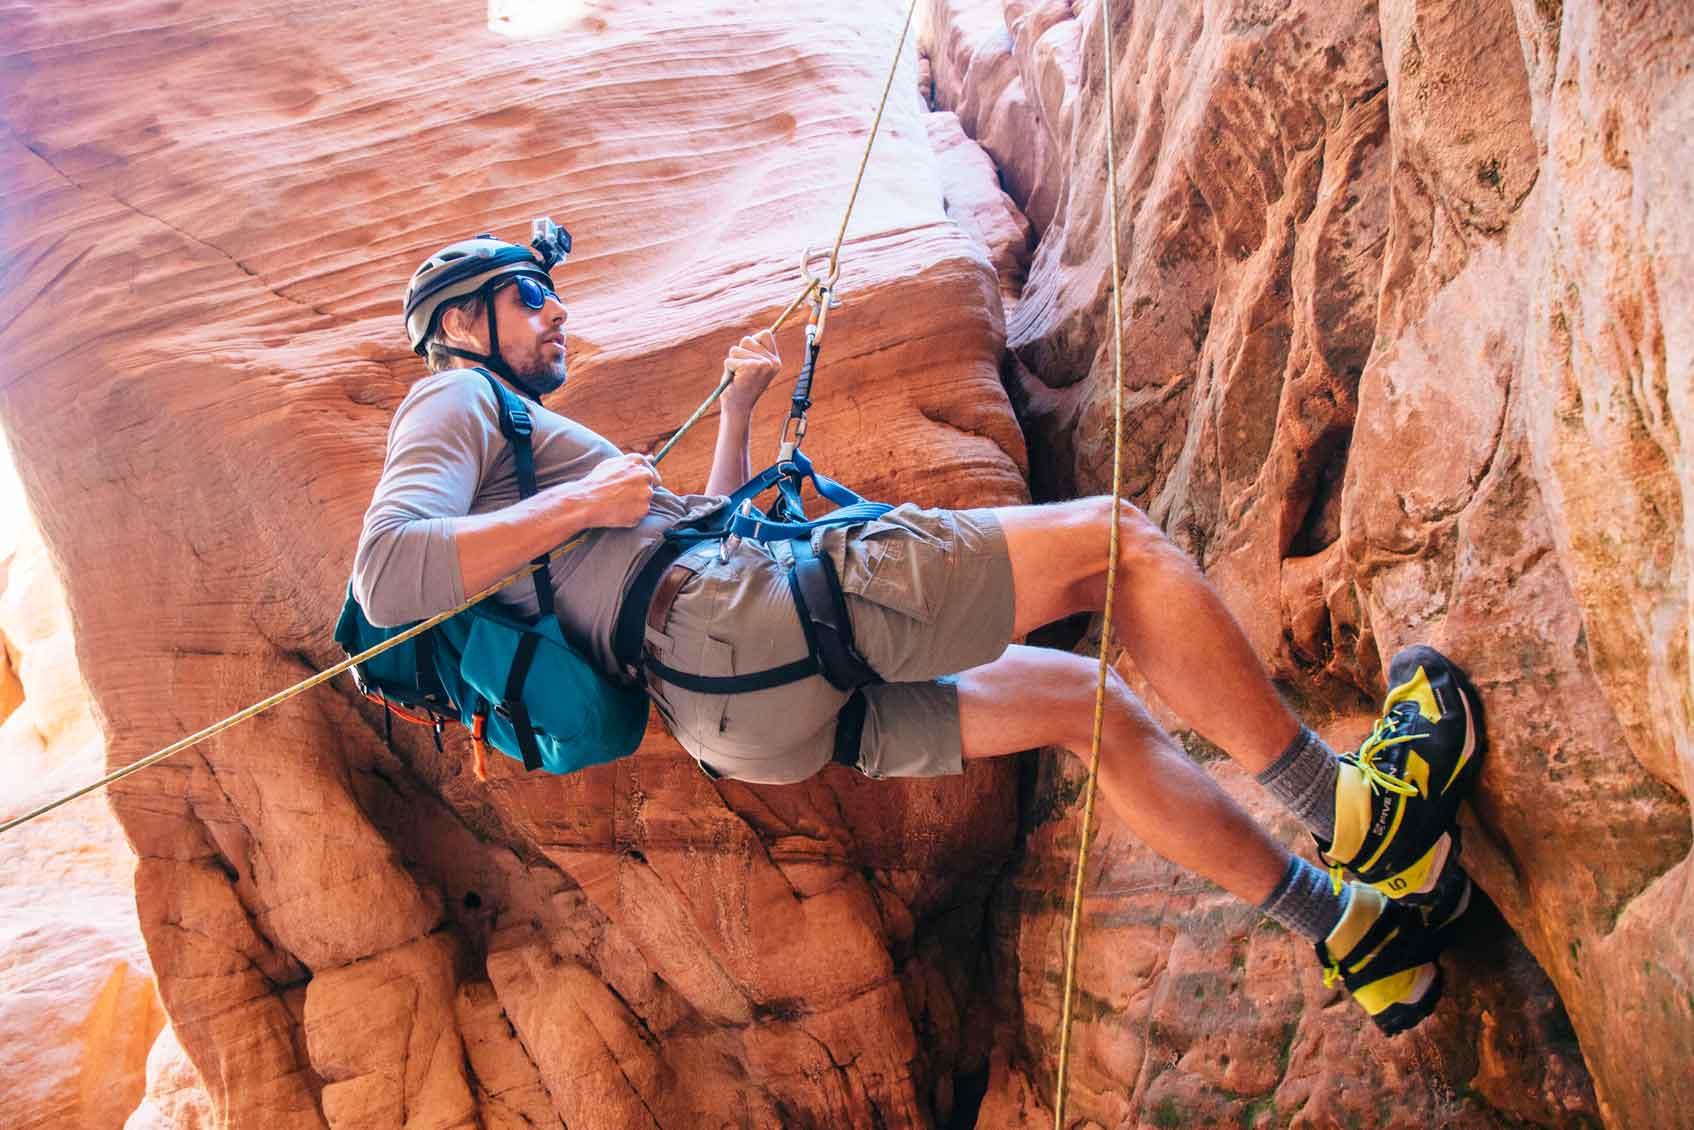 Canyoneering Zion Adventure Company Rappelling The Huntress Slot Canyon 2